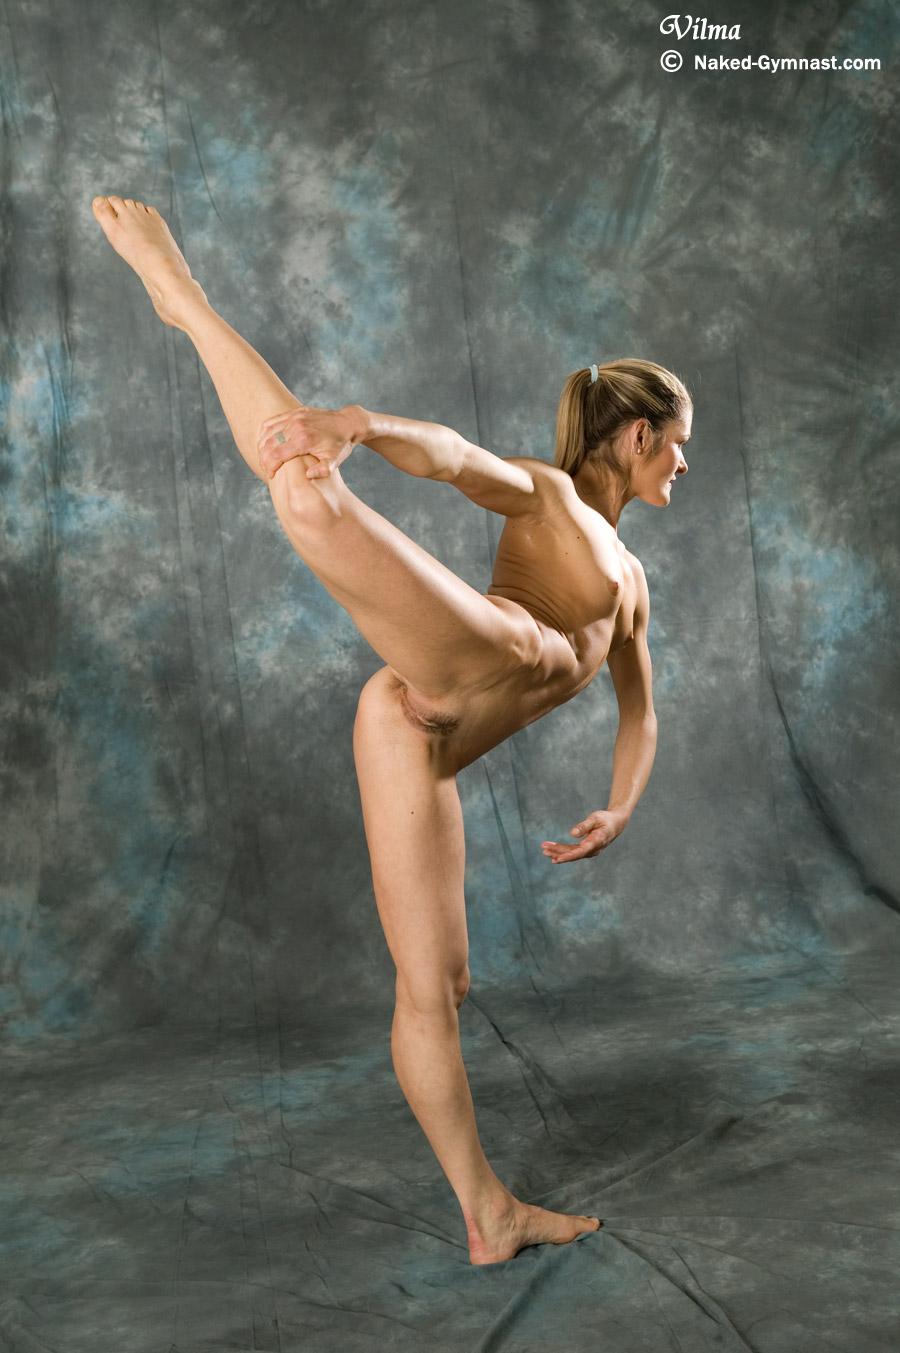 nude gymnast pics